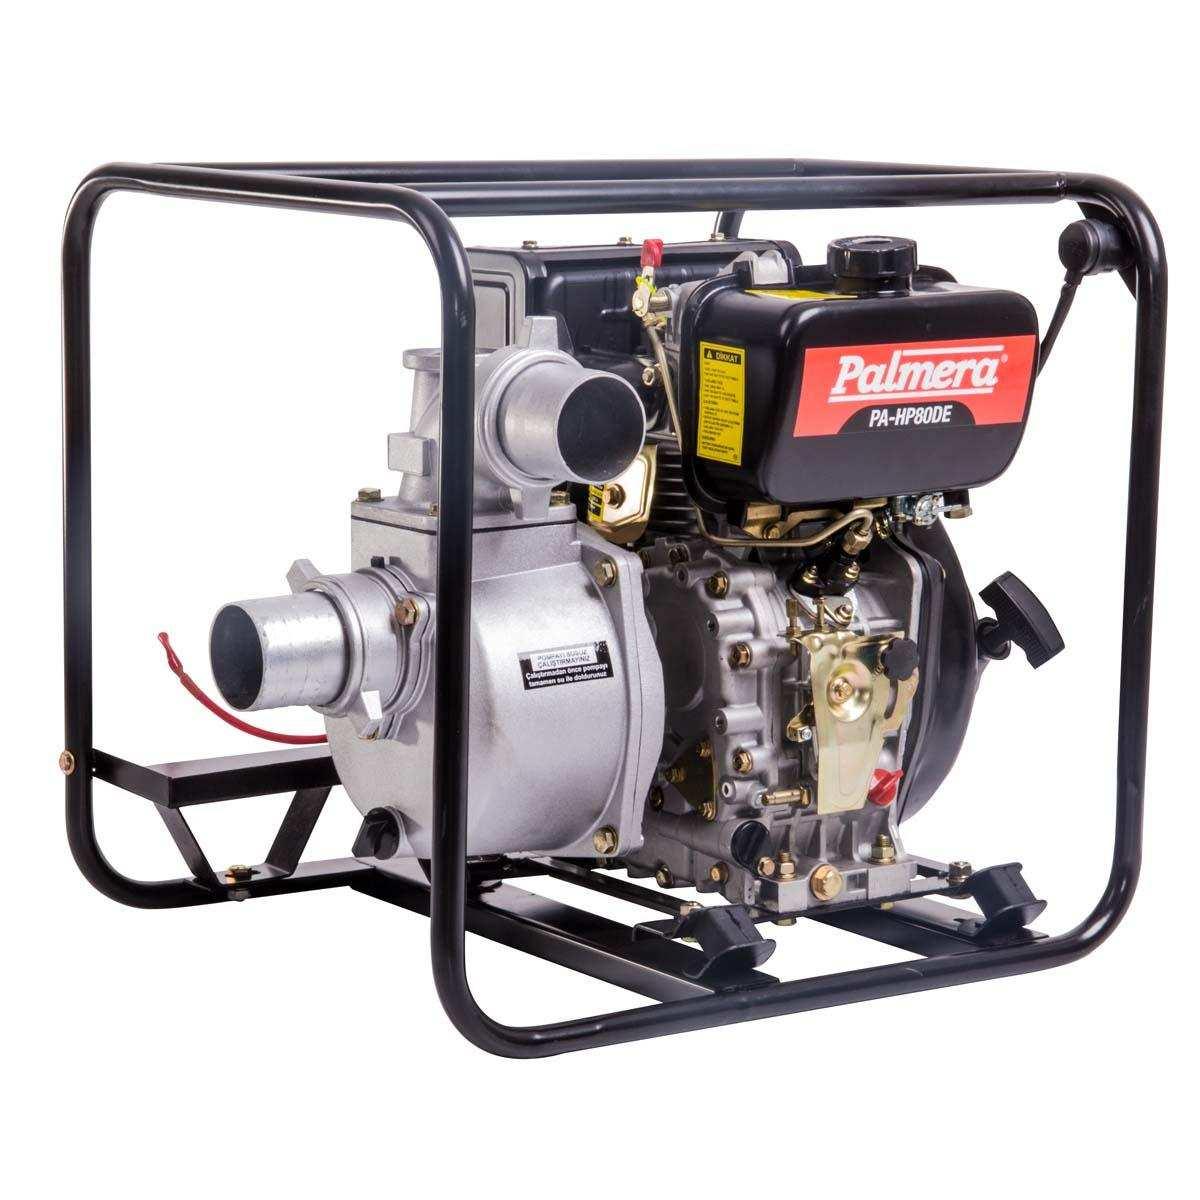 Palmera HP80DE Dizel Marşlı Su Motoru 3